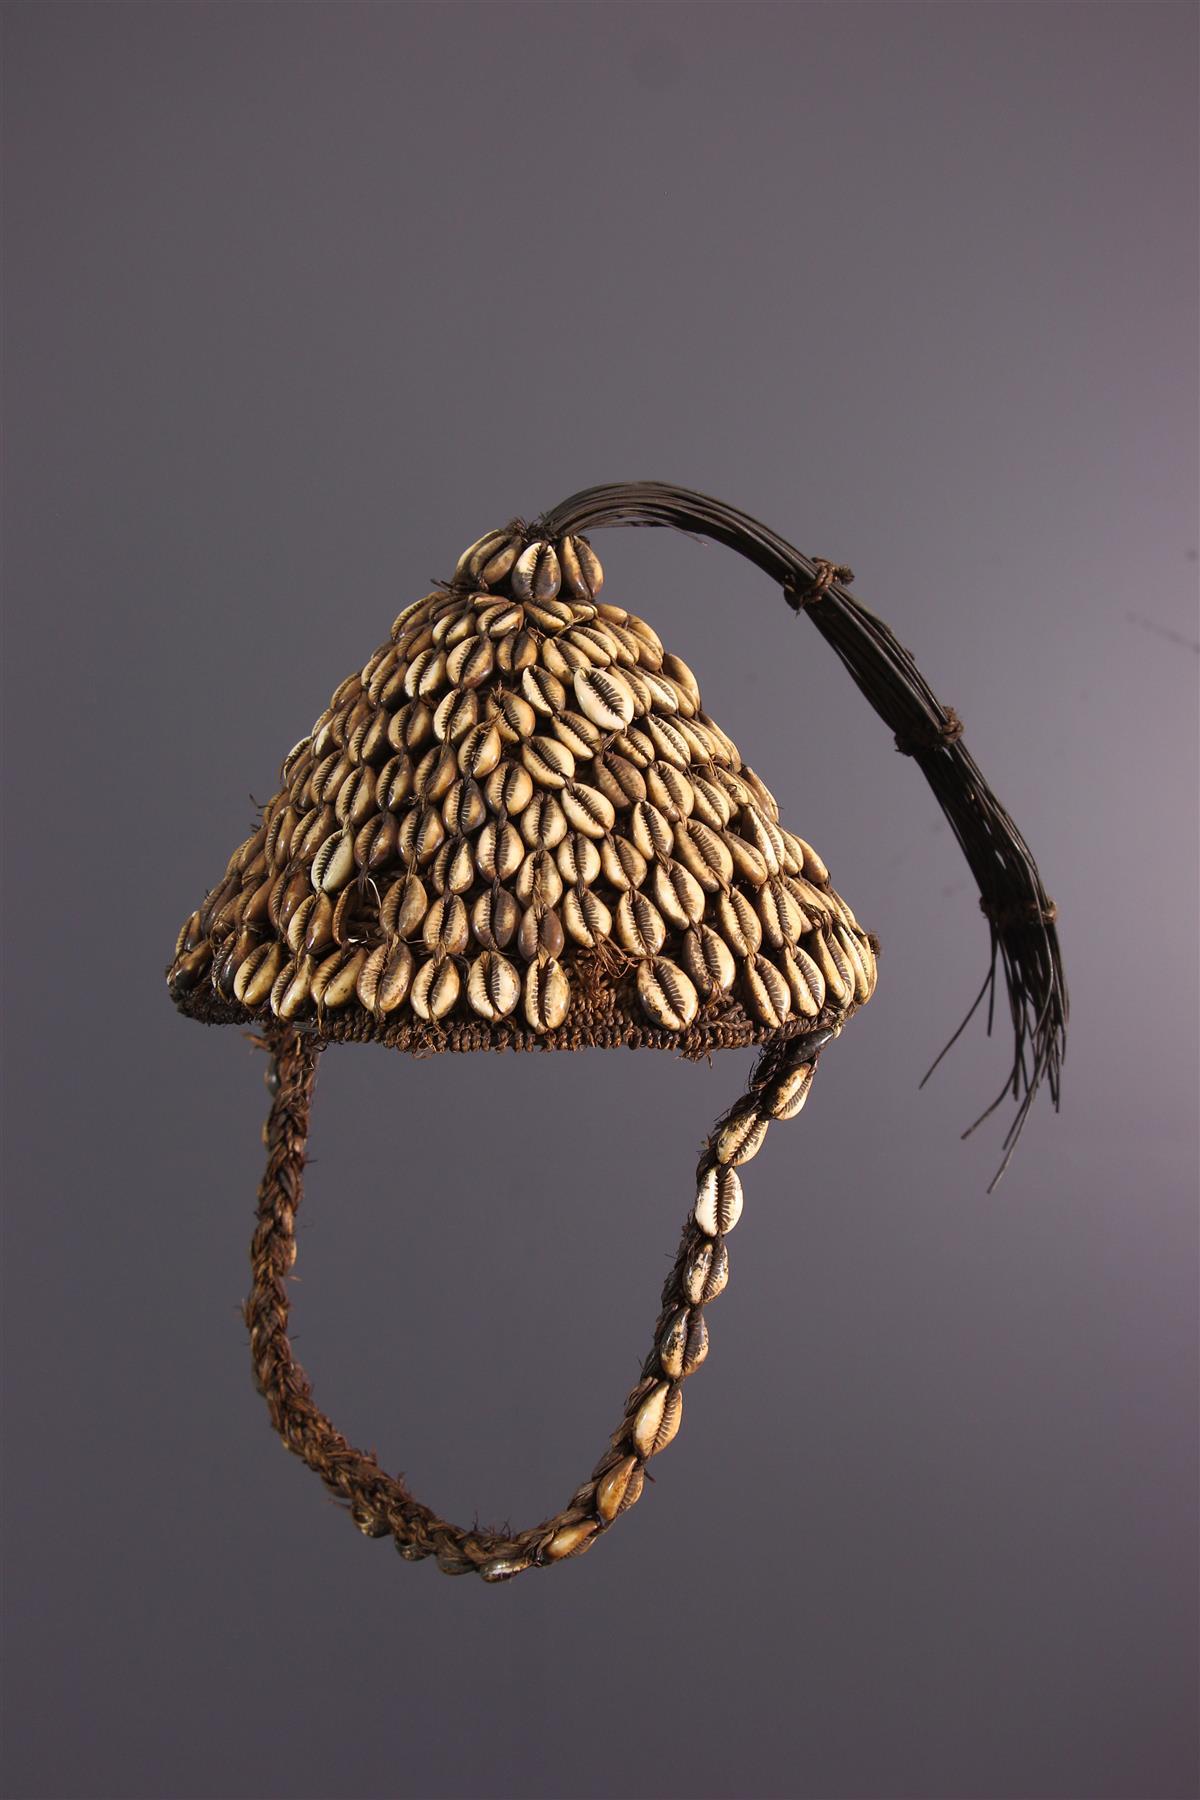 Mukaba Hairstyle - African art